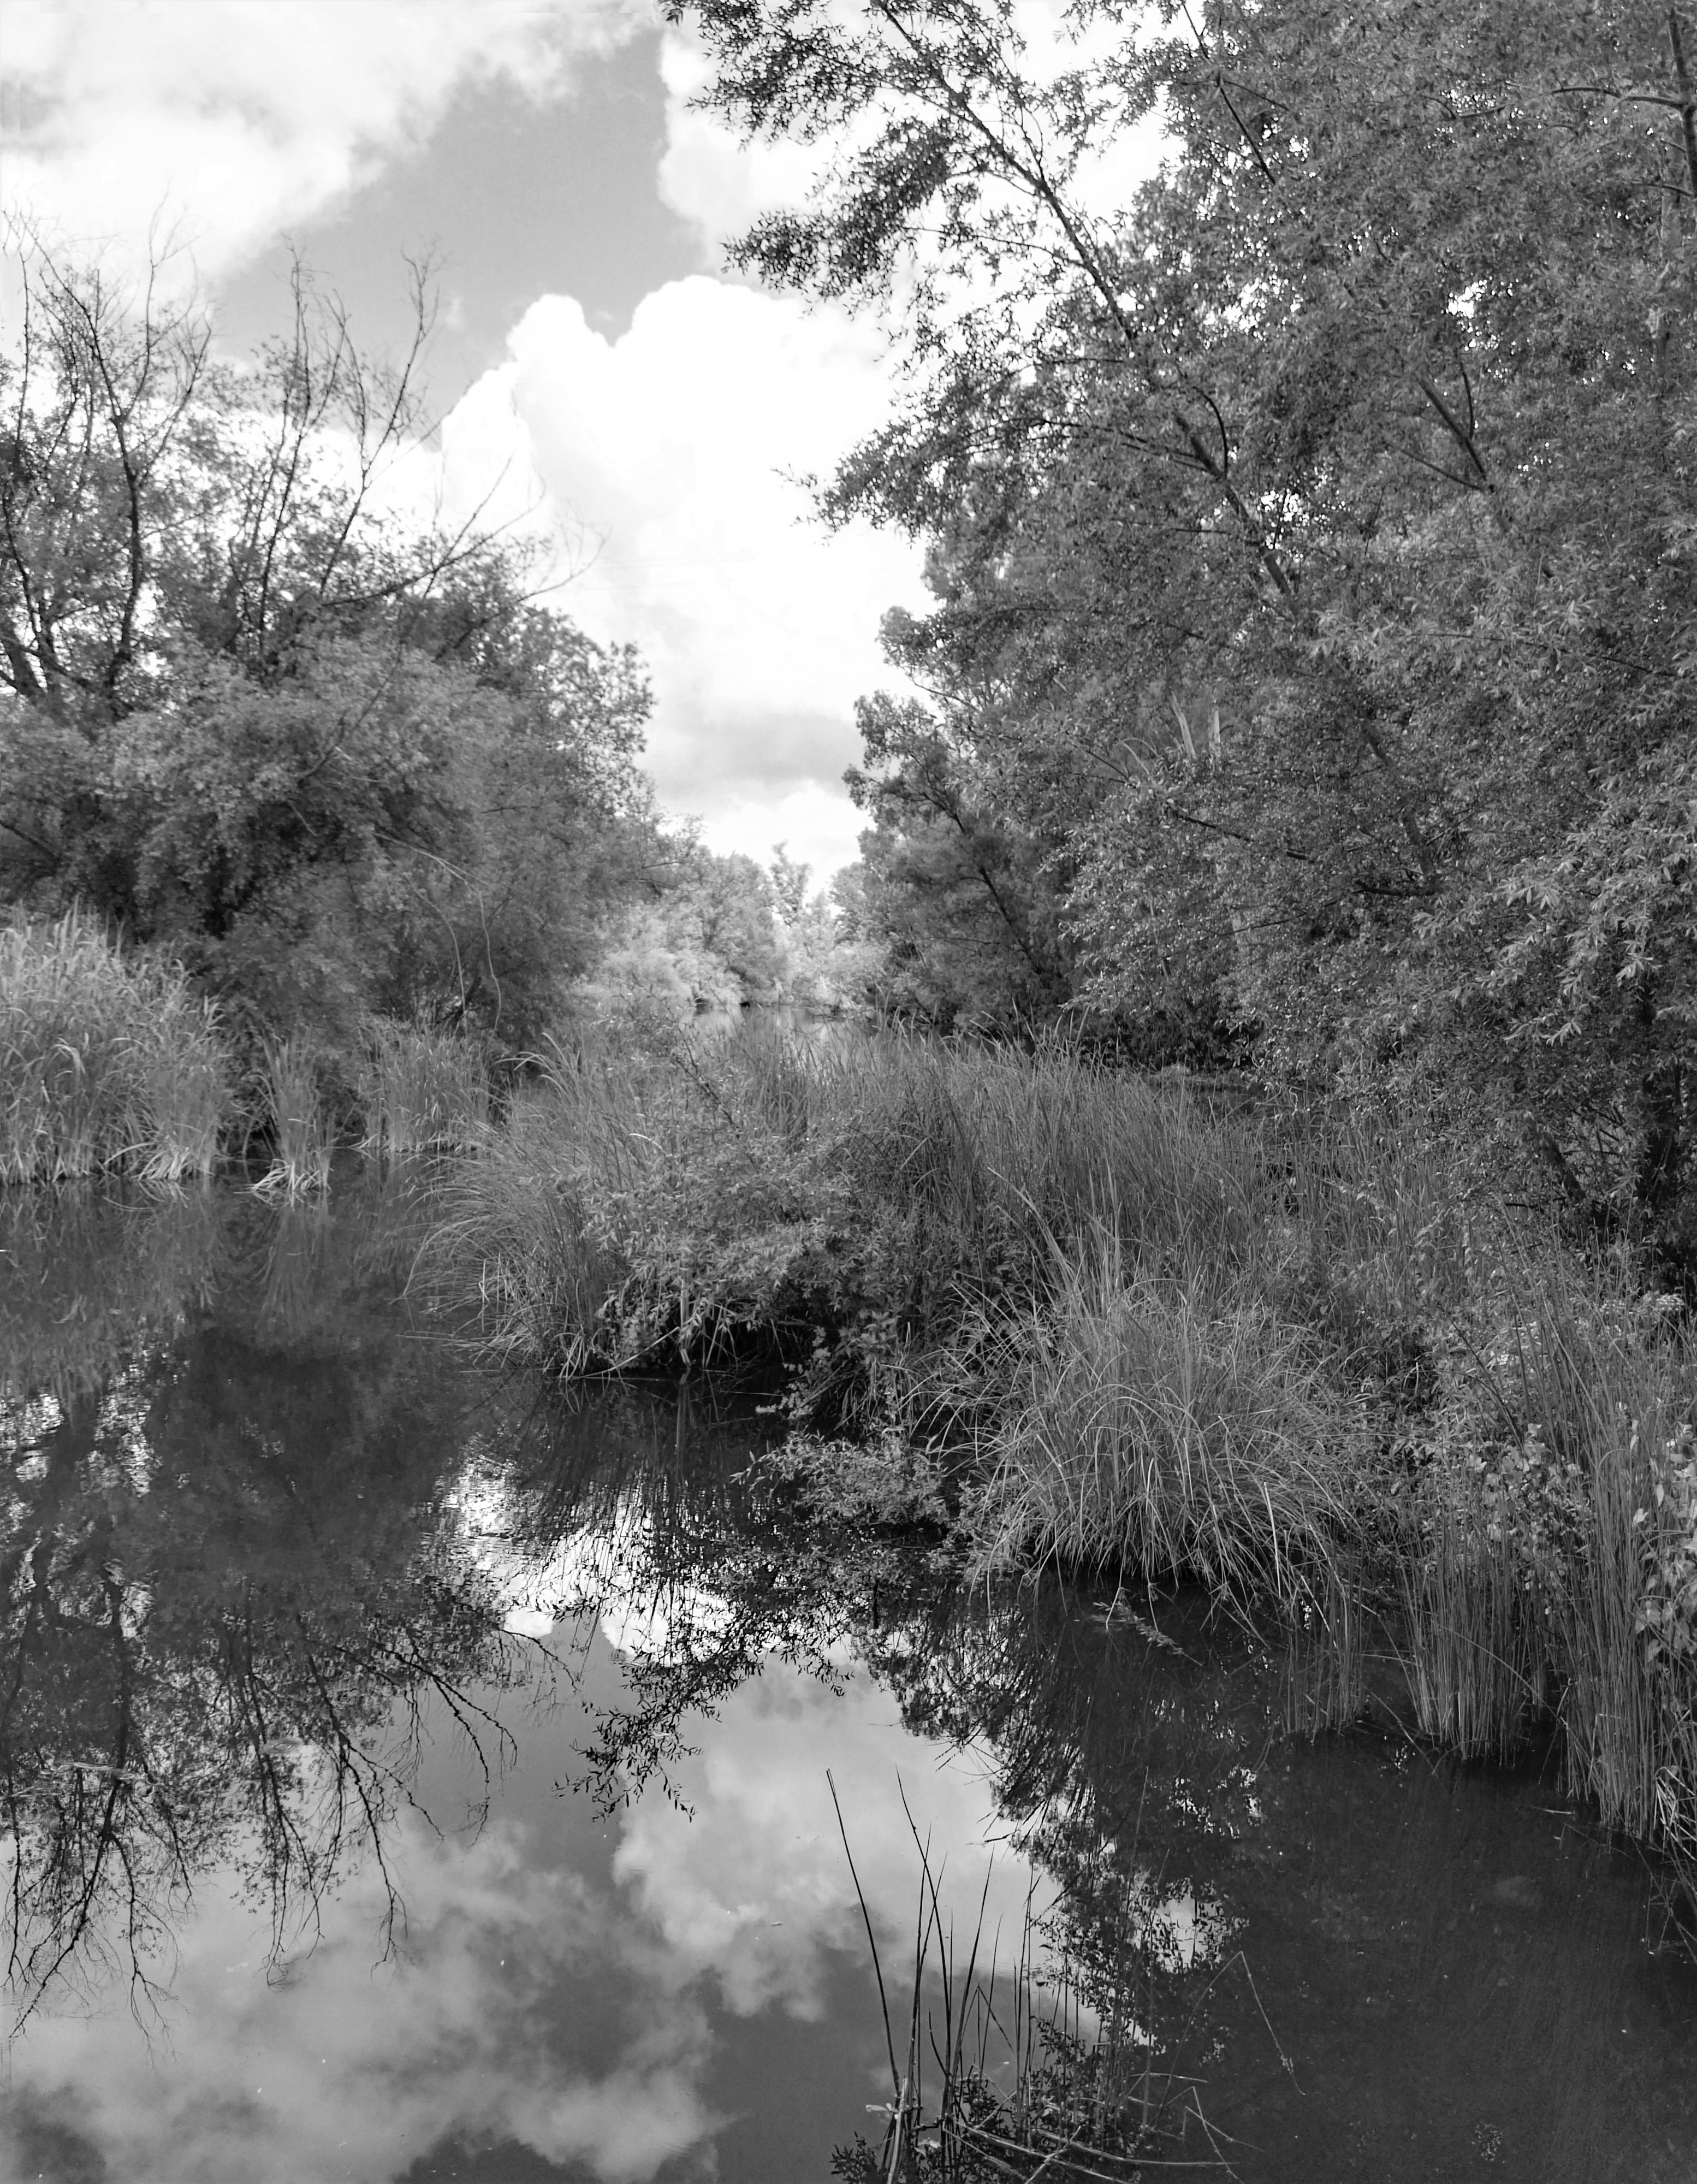 Río Ardila / Ardila river